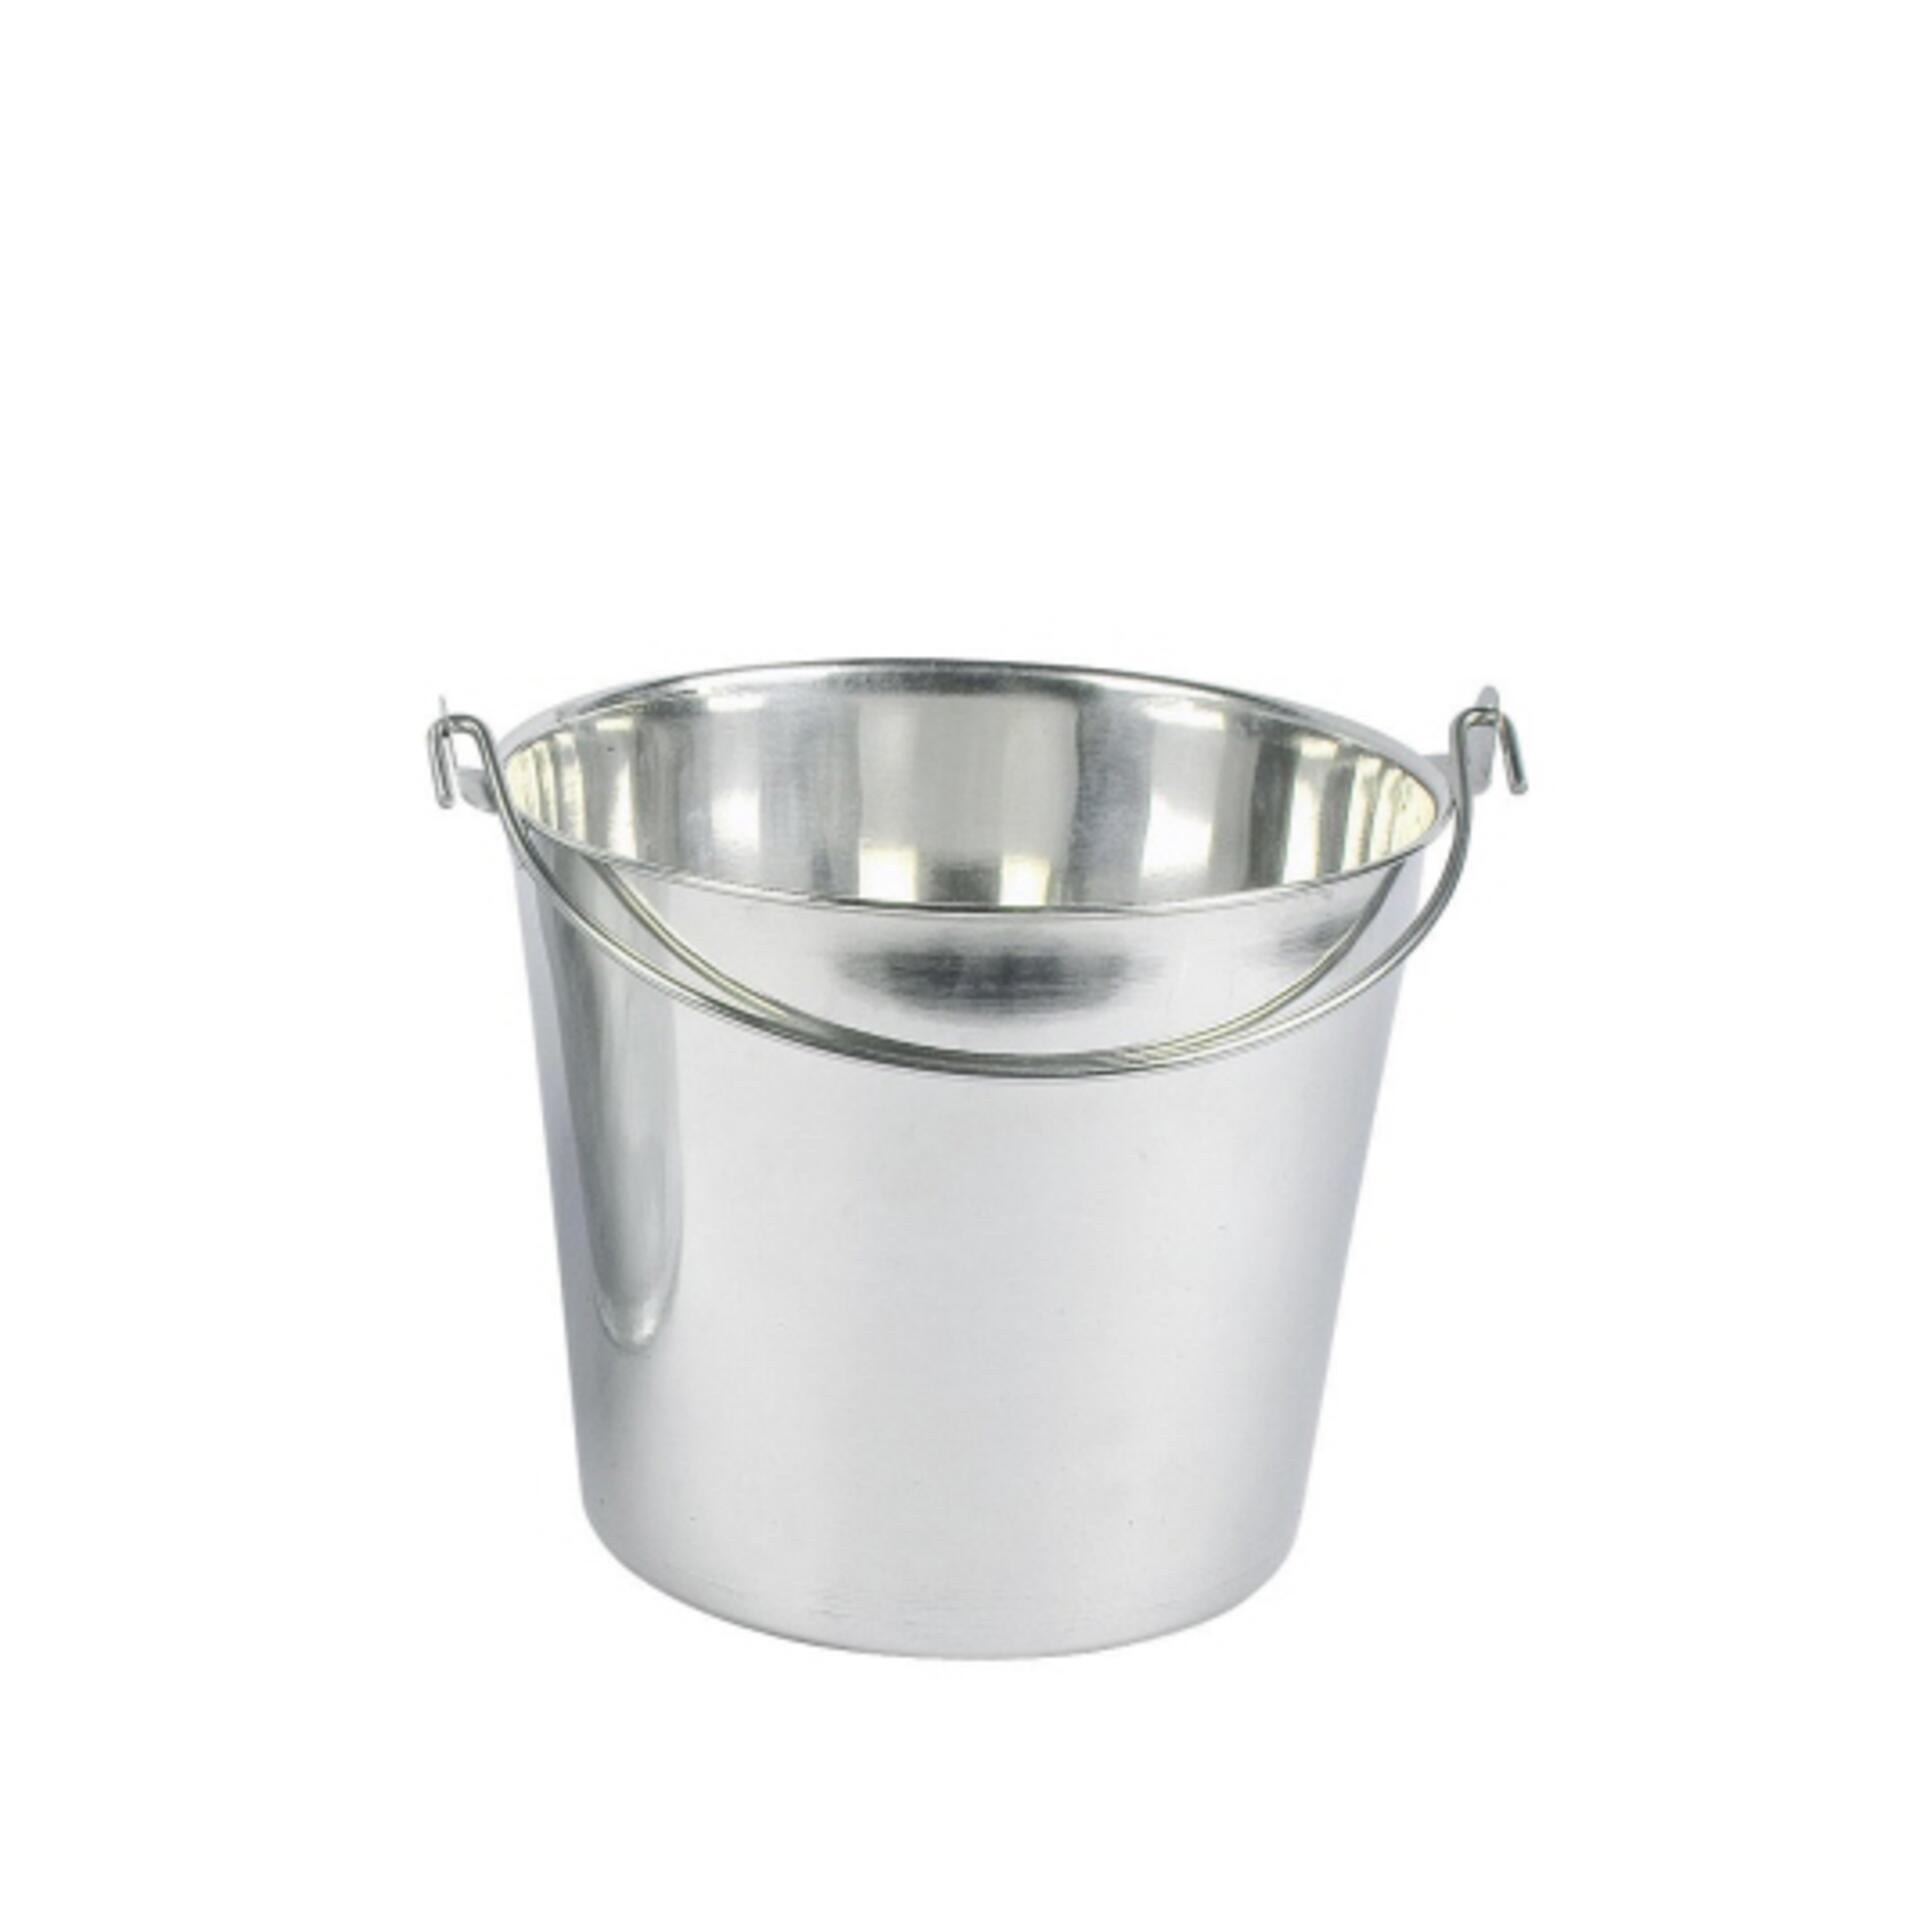 Eimer aus Edelstahl 8 Liter